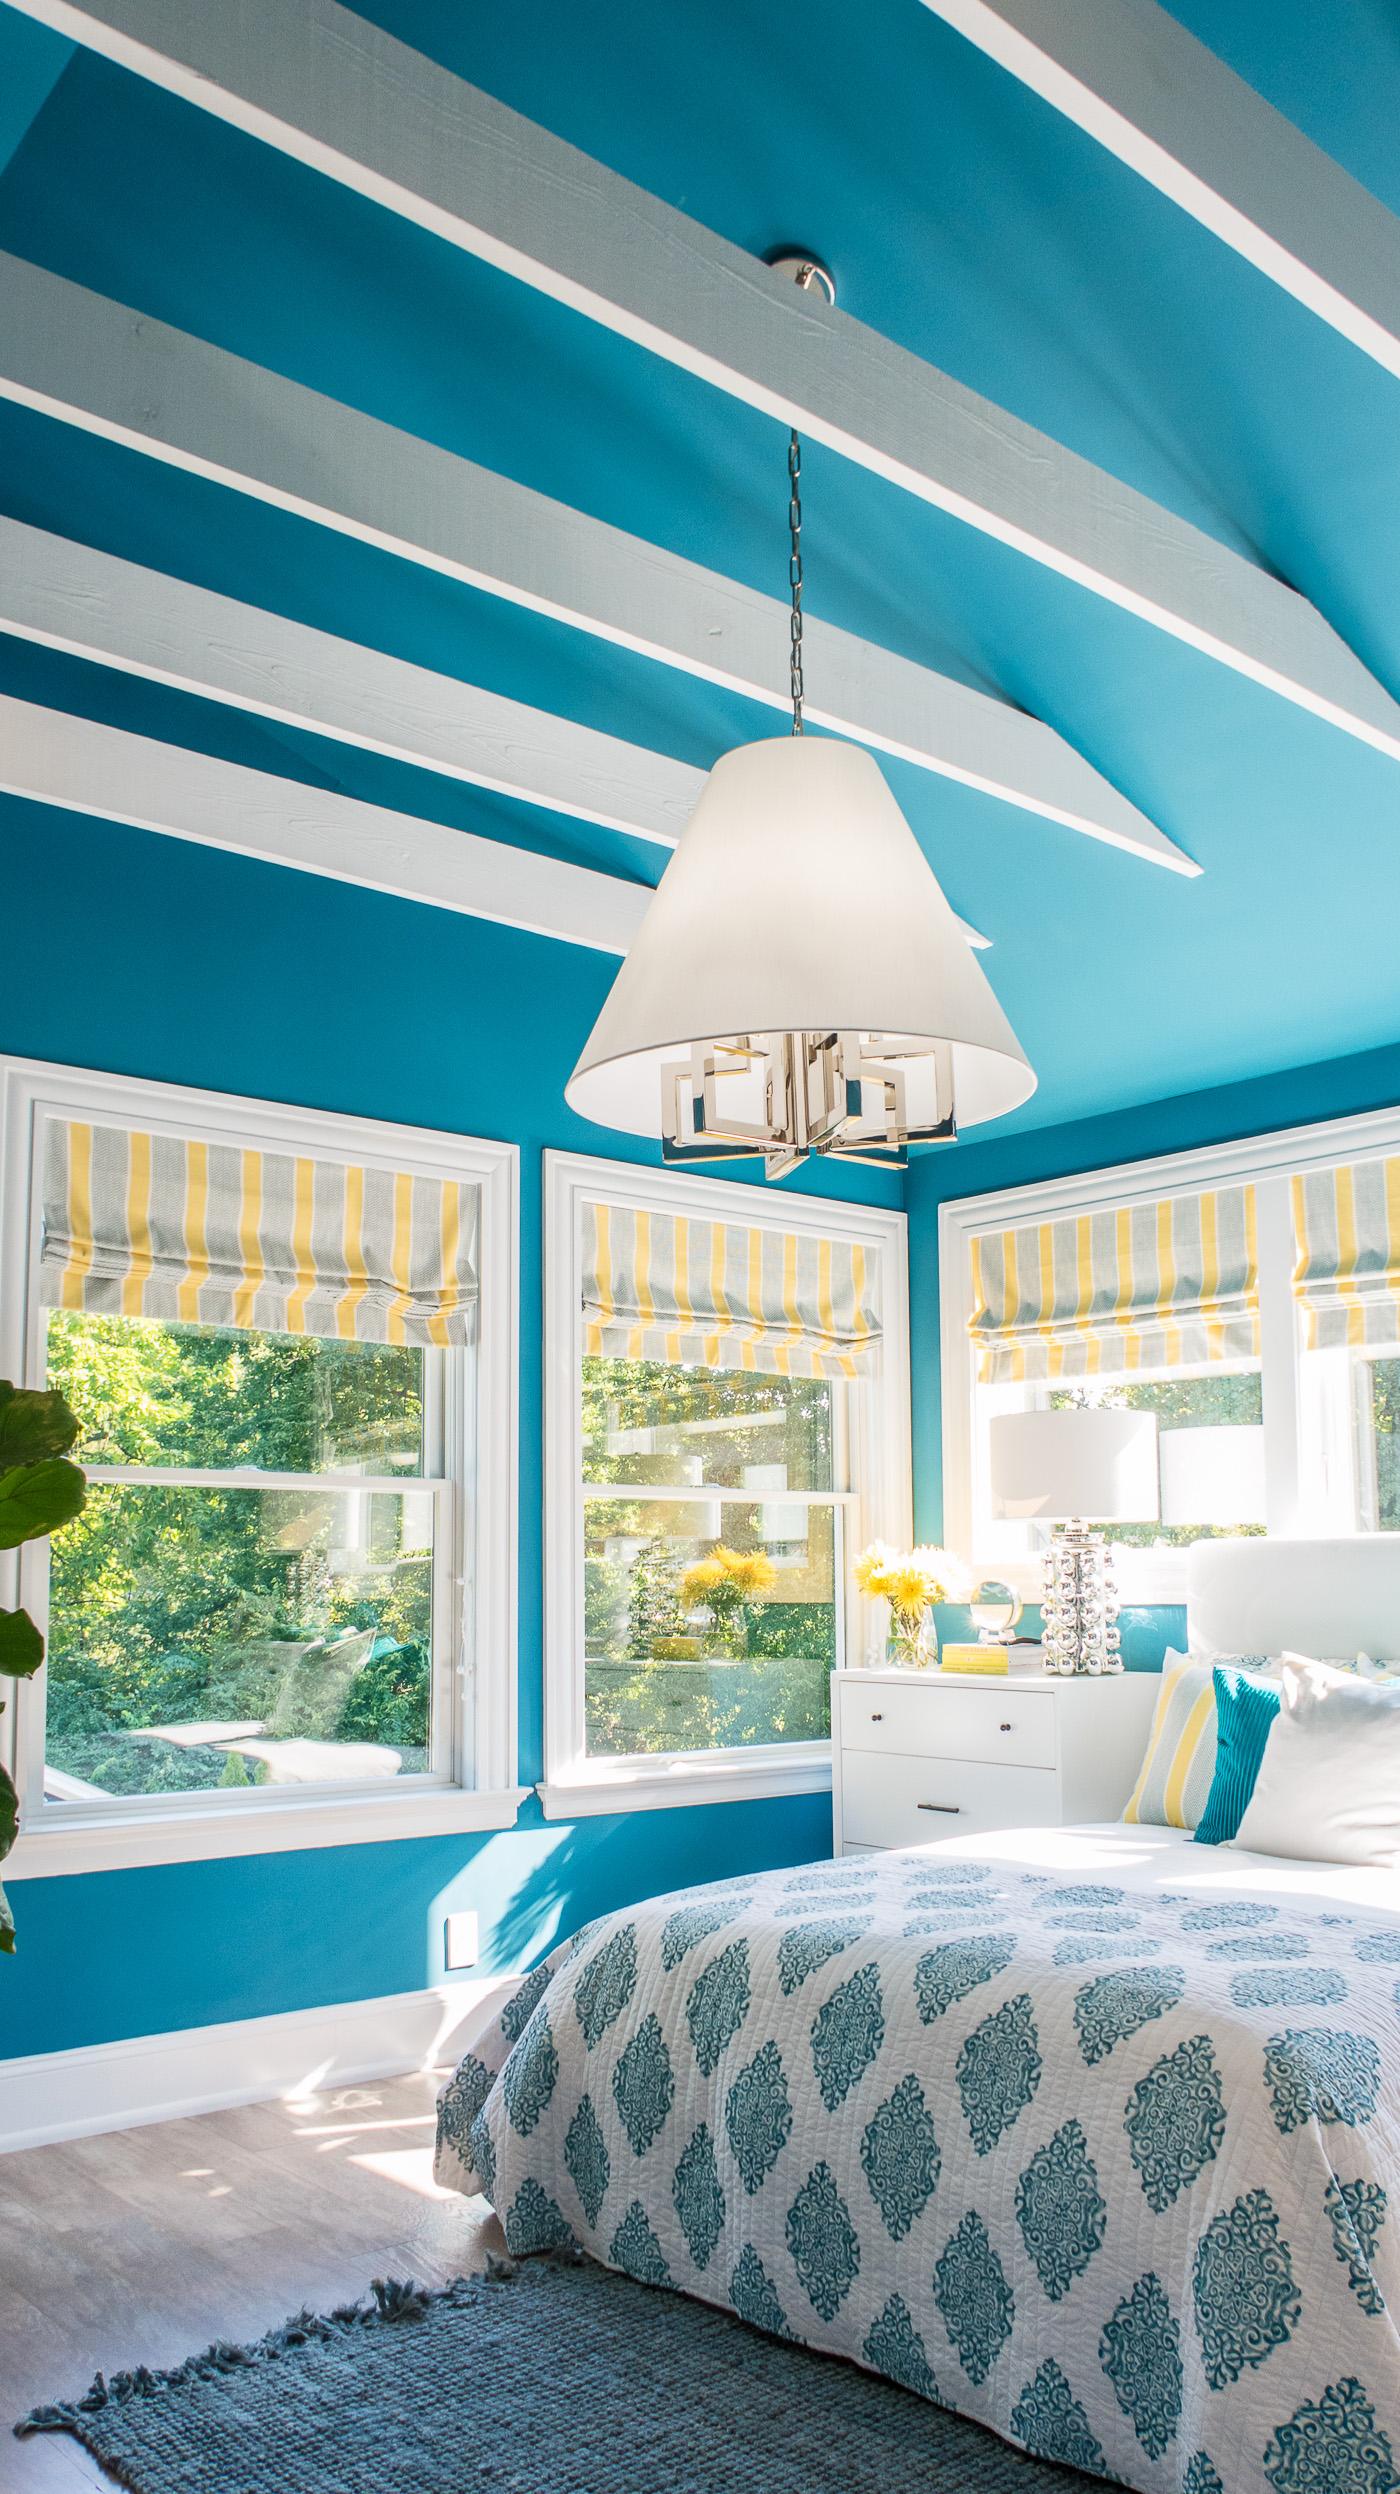 Blue Bedroom with Wood Beams